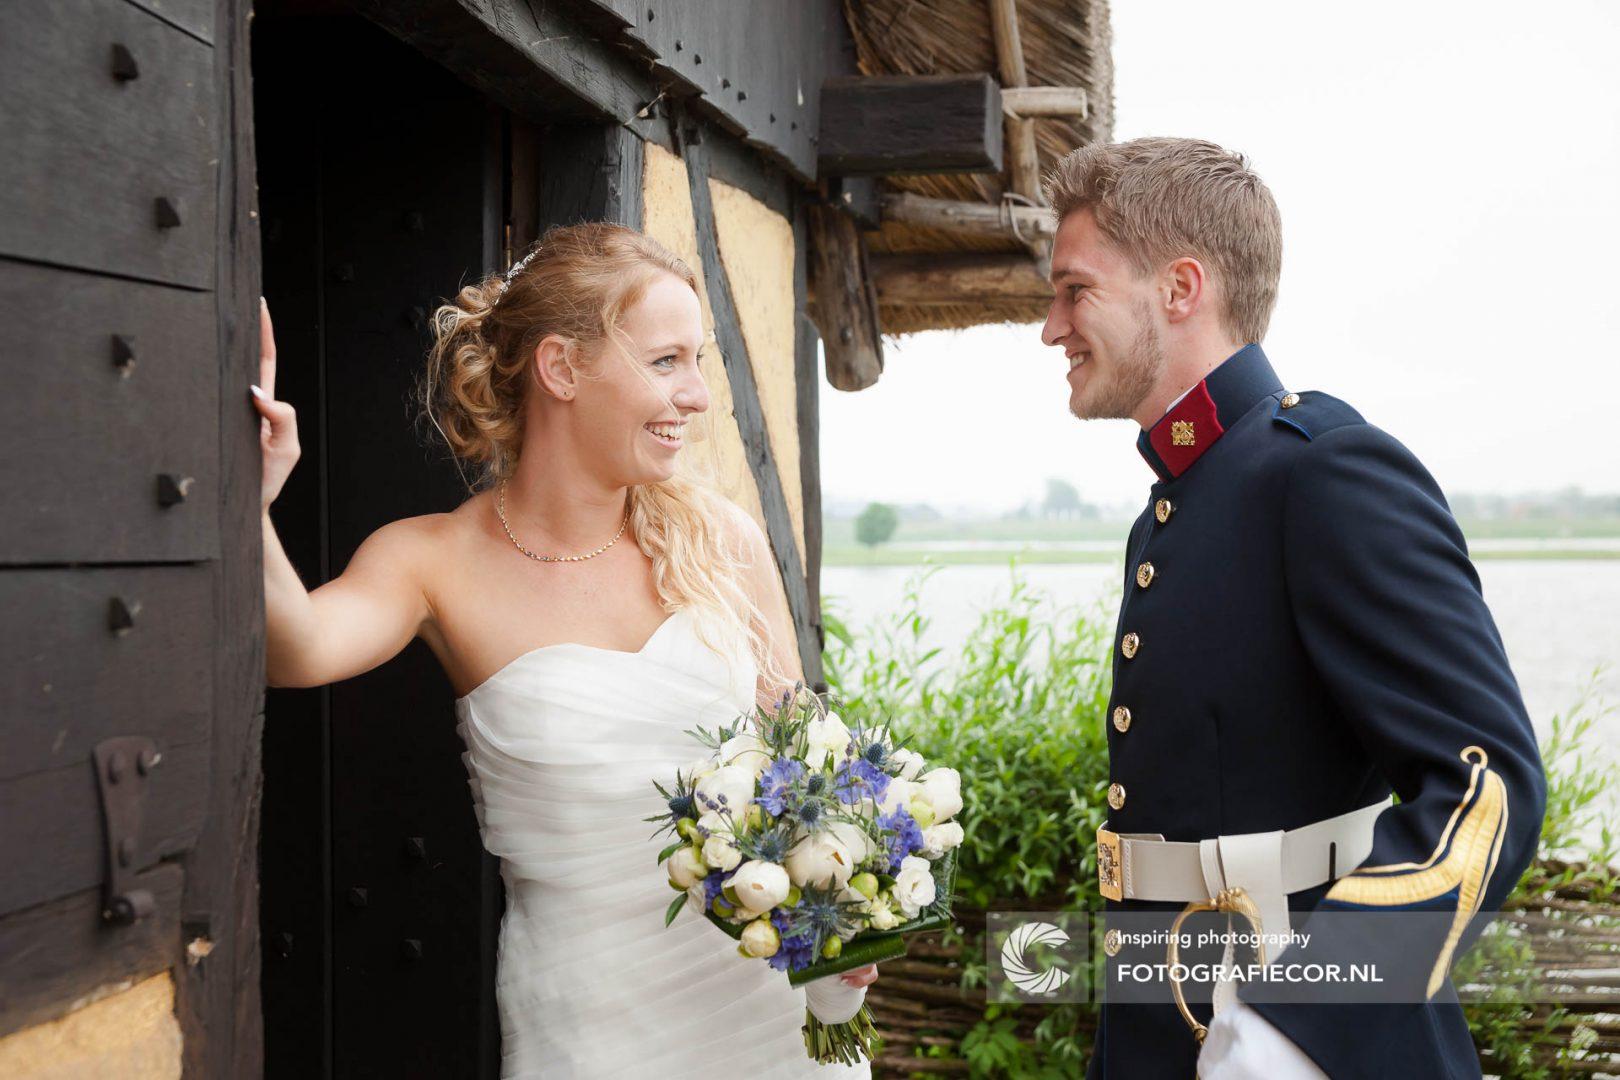 trouwfoto | trouwreportage | Koggewerf | huwelijk | fotograaf | foto | locatie | Trouwen